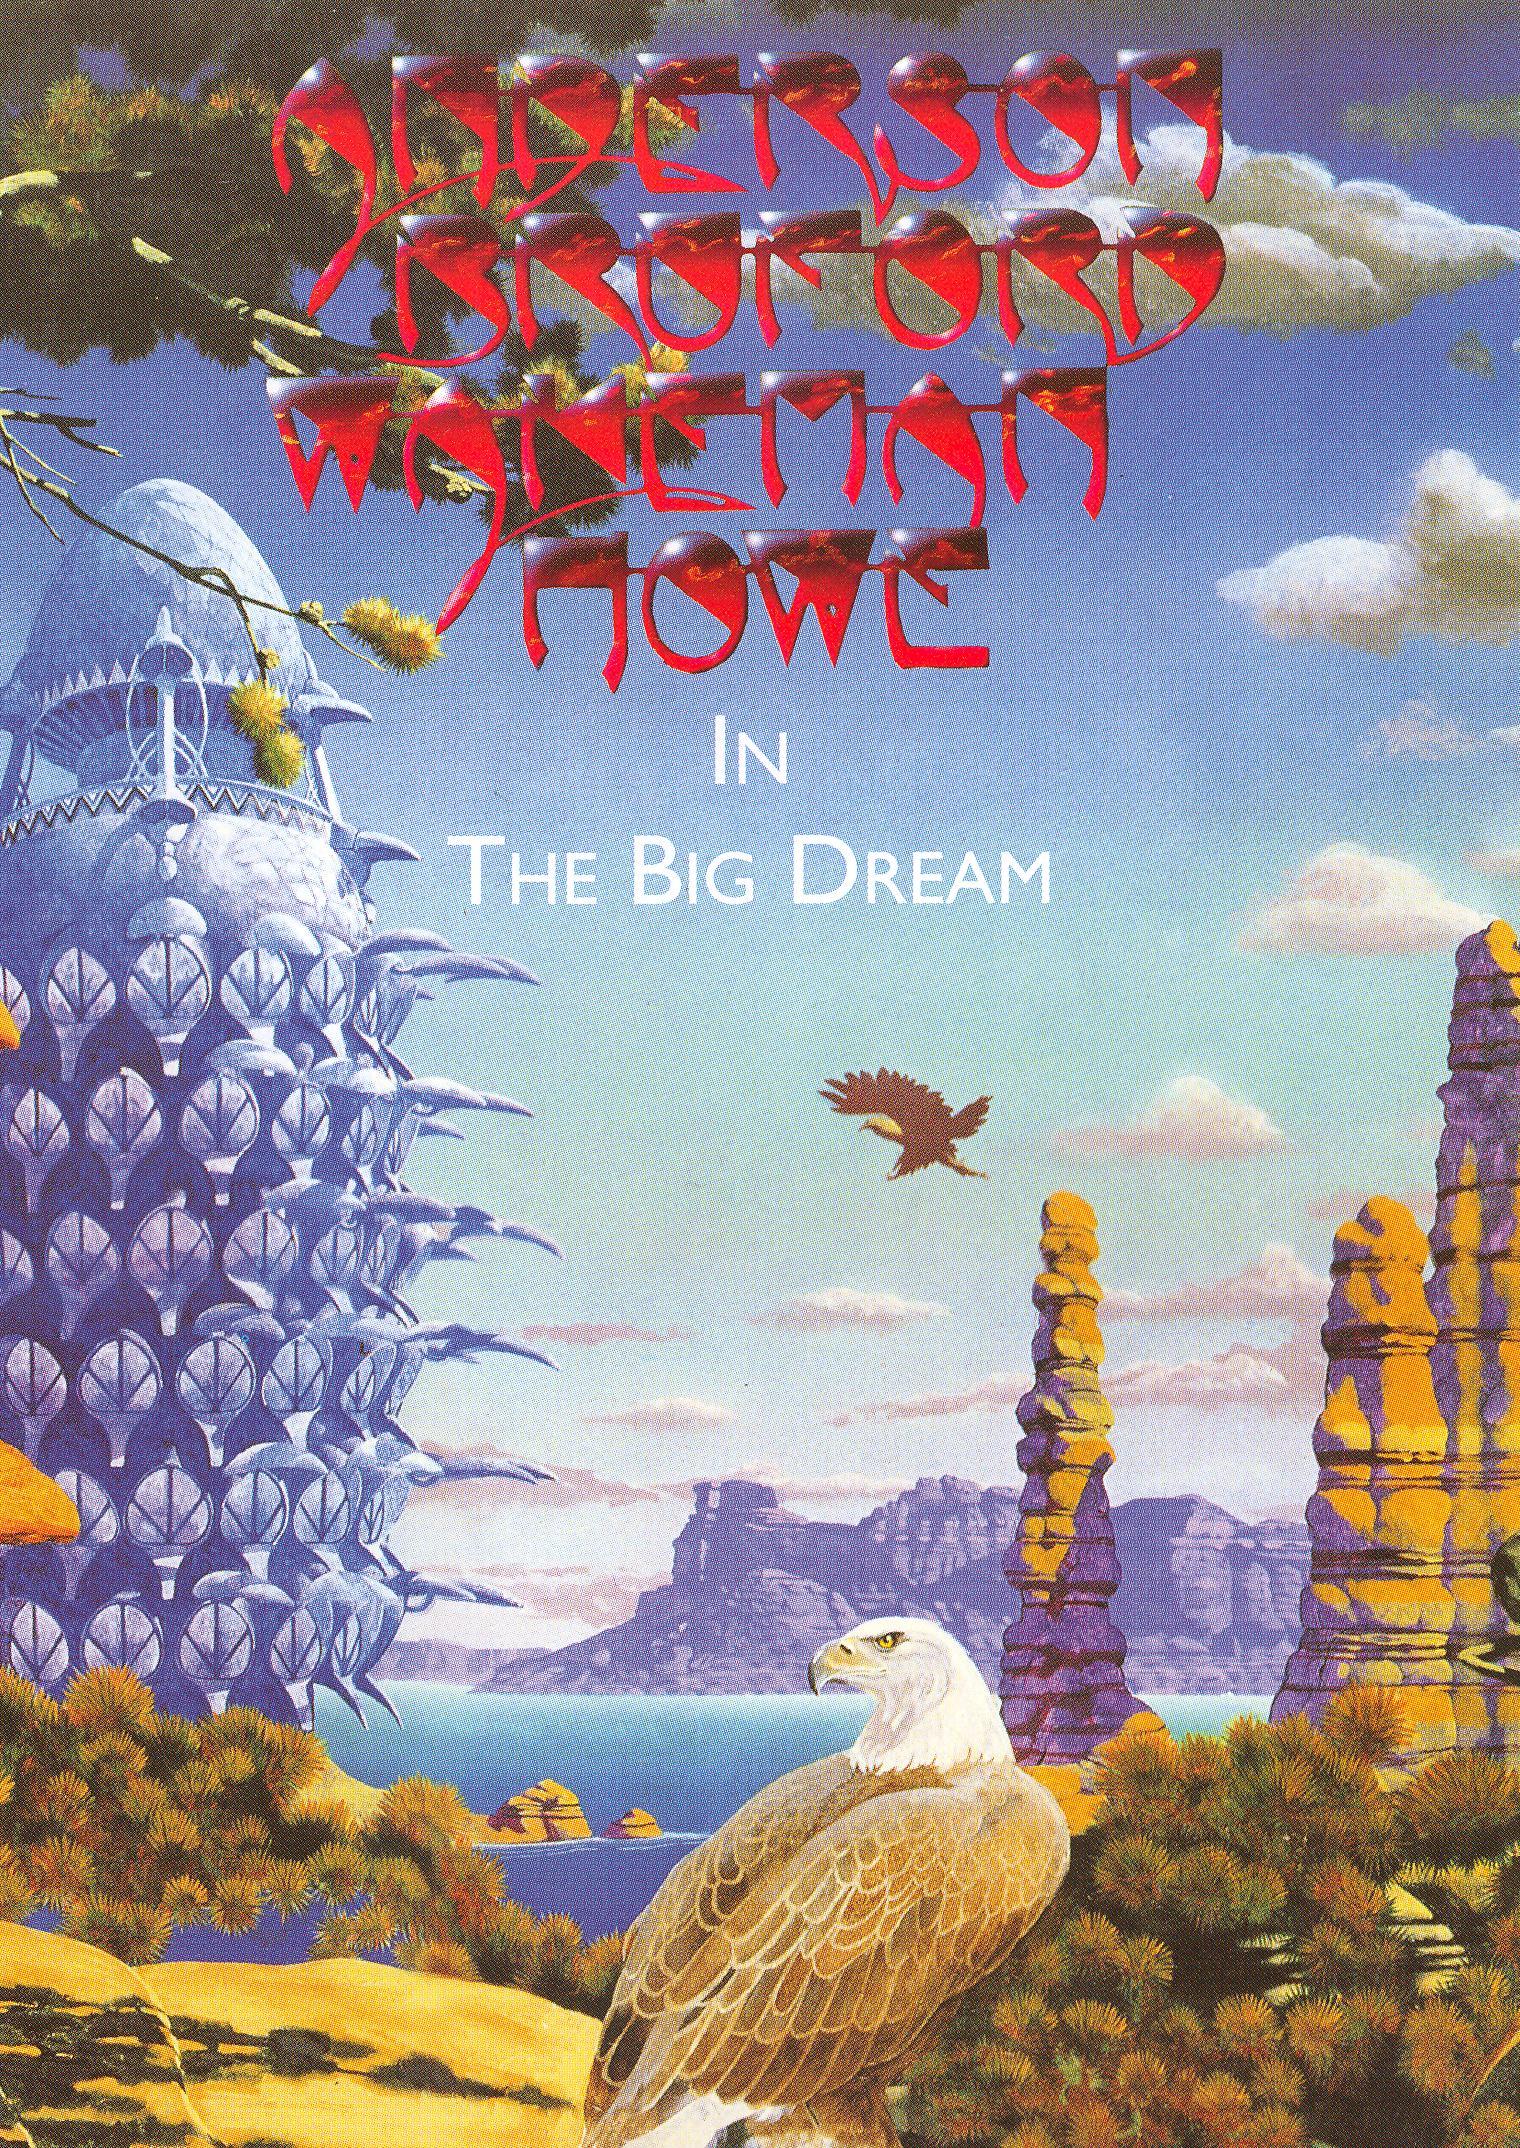 Anderson, Bruford, Wakeman & Howe: In The Big Dream